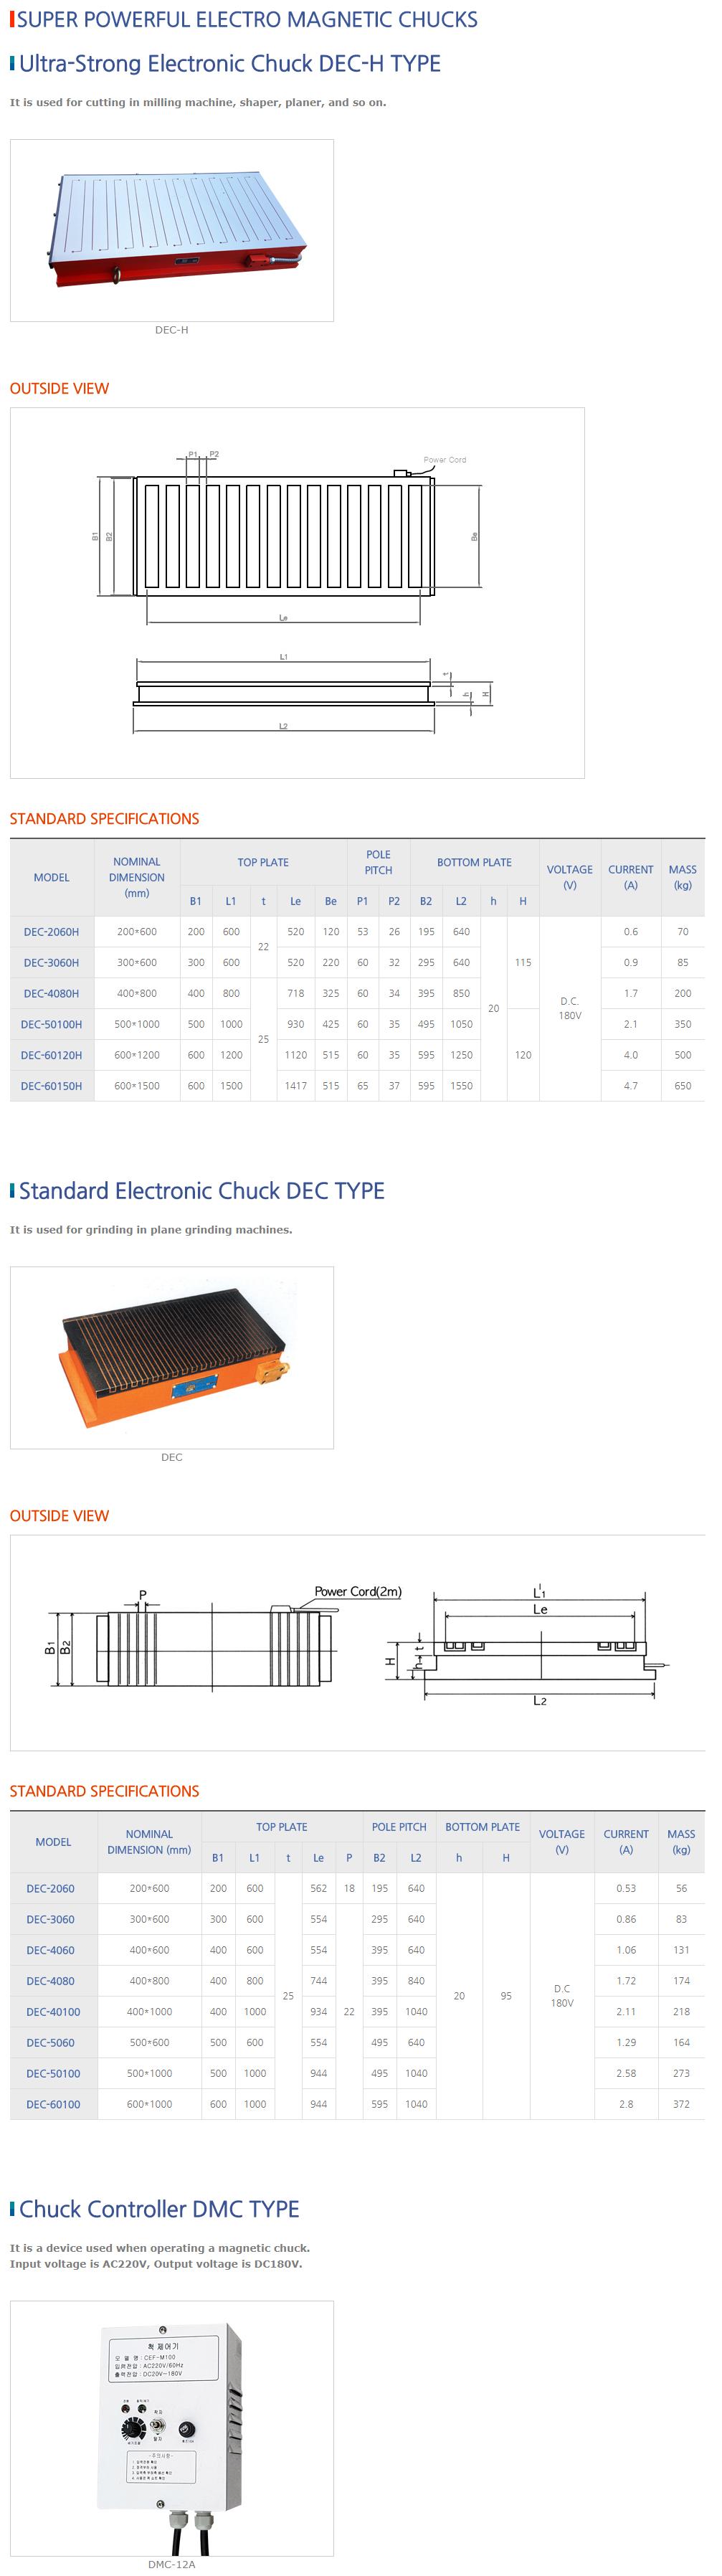 DAESUNG MARGNET Super Powerful Electro Magnetic Chucks DEC-H Type